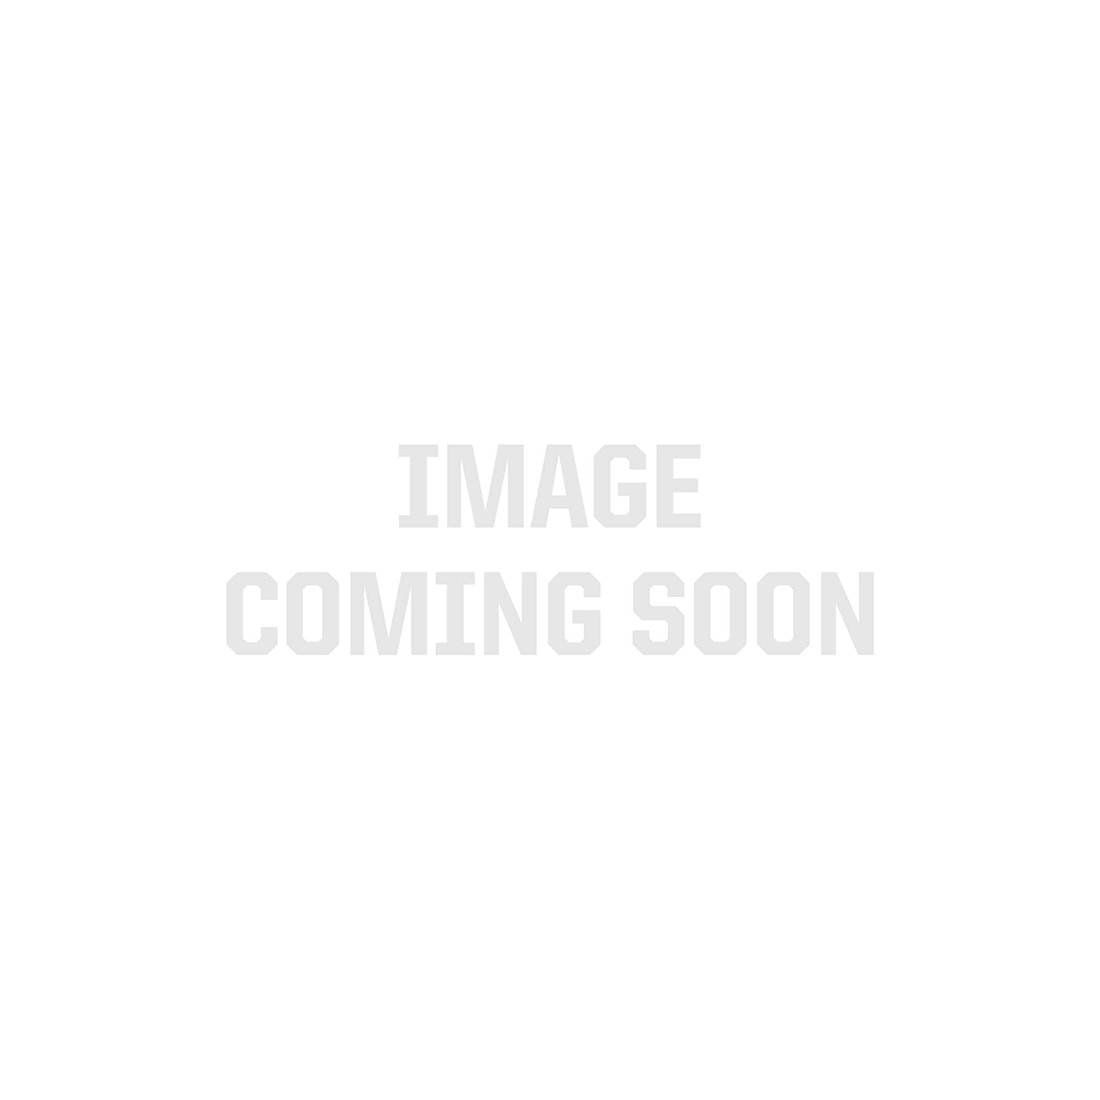 Zinc Mounting Bracket for Klus 45-ALU Aluminum Channel